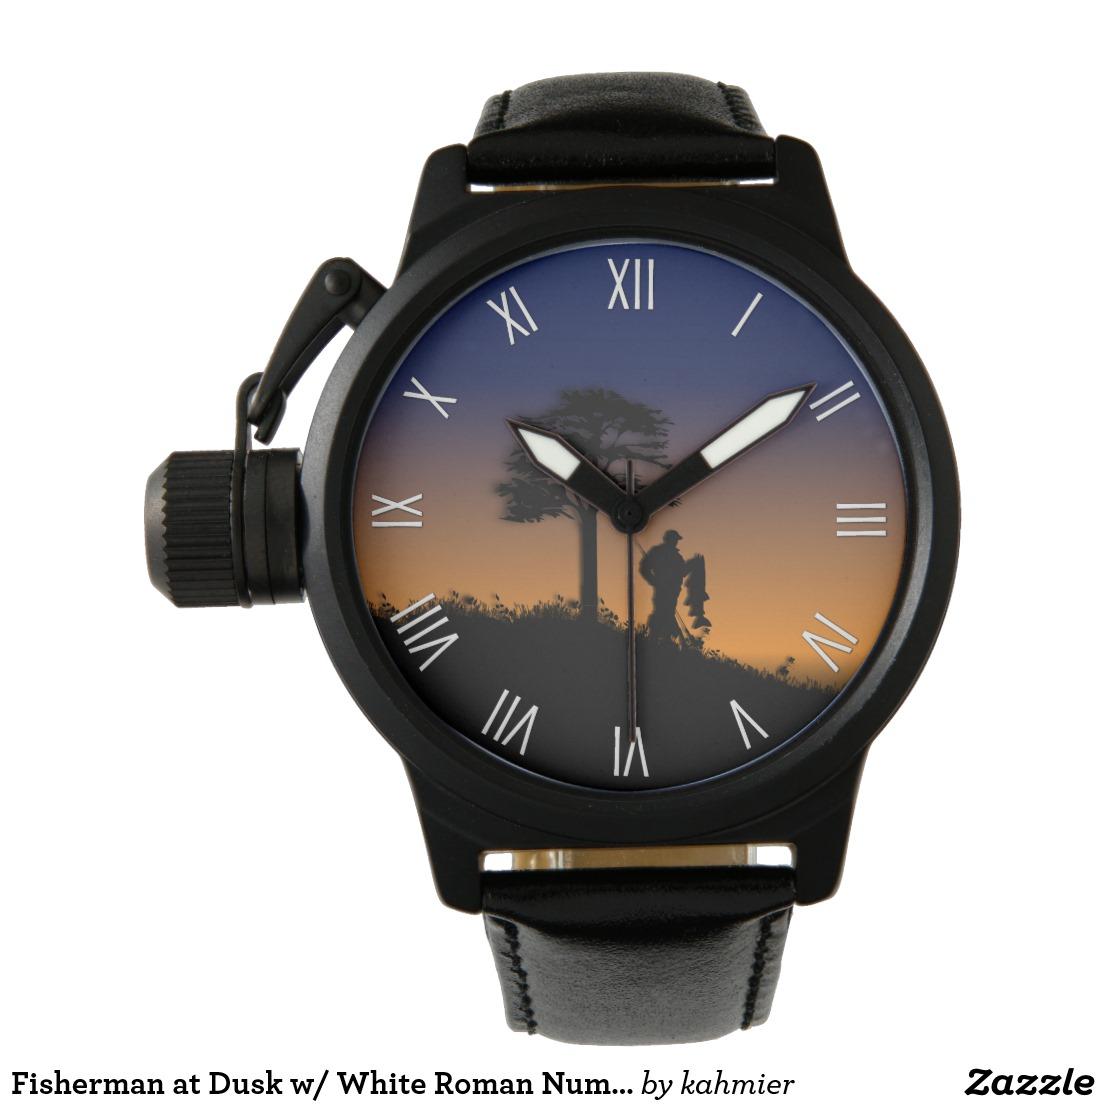 Fisherman at Dusk w/ White Roman Numerals Watch